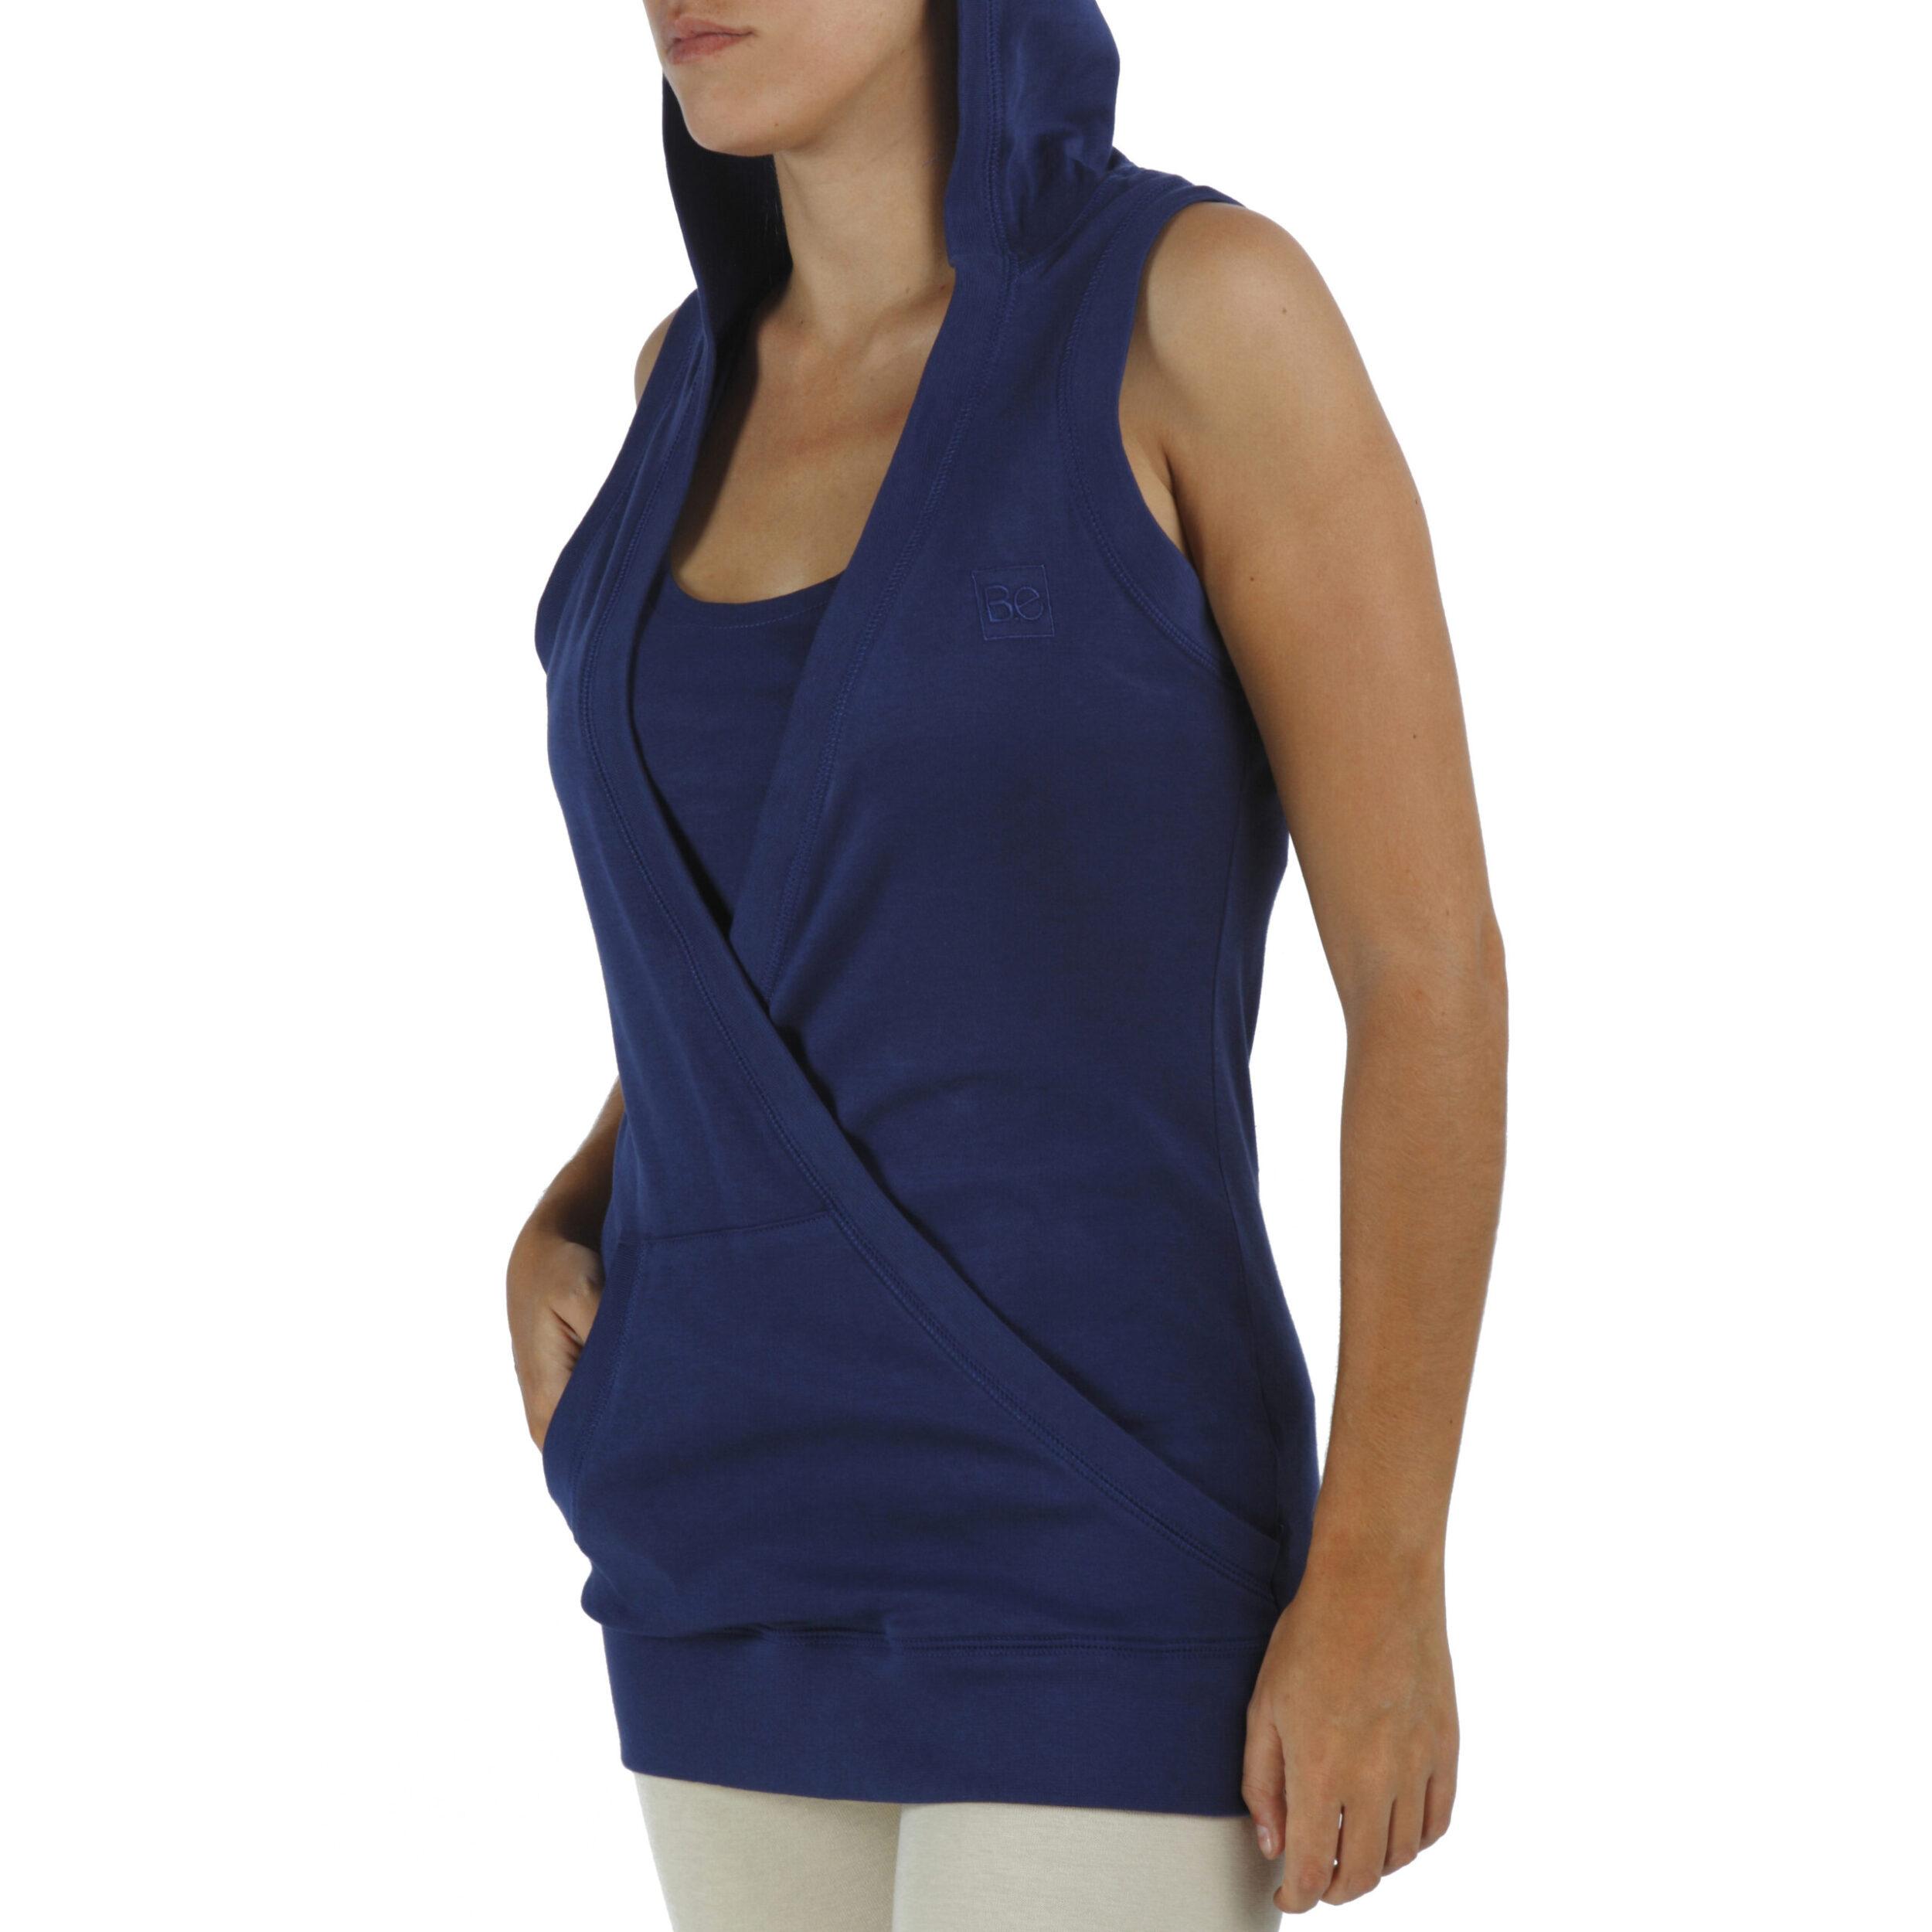 hooded crossed sleeveless toporganic pima cotton slowfashion quality blue